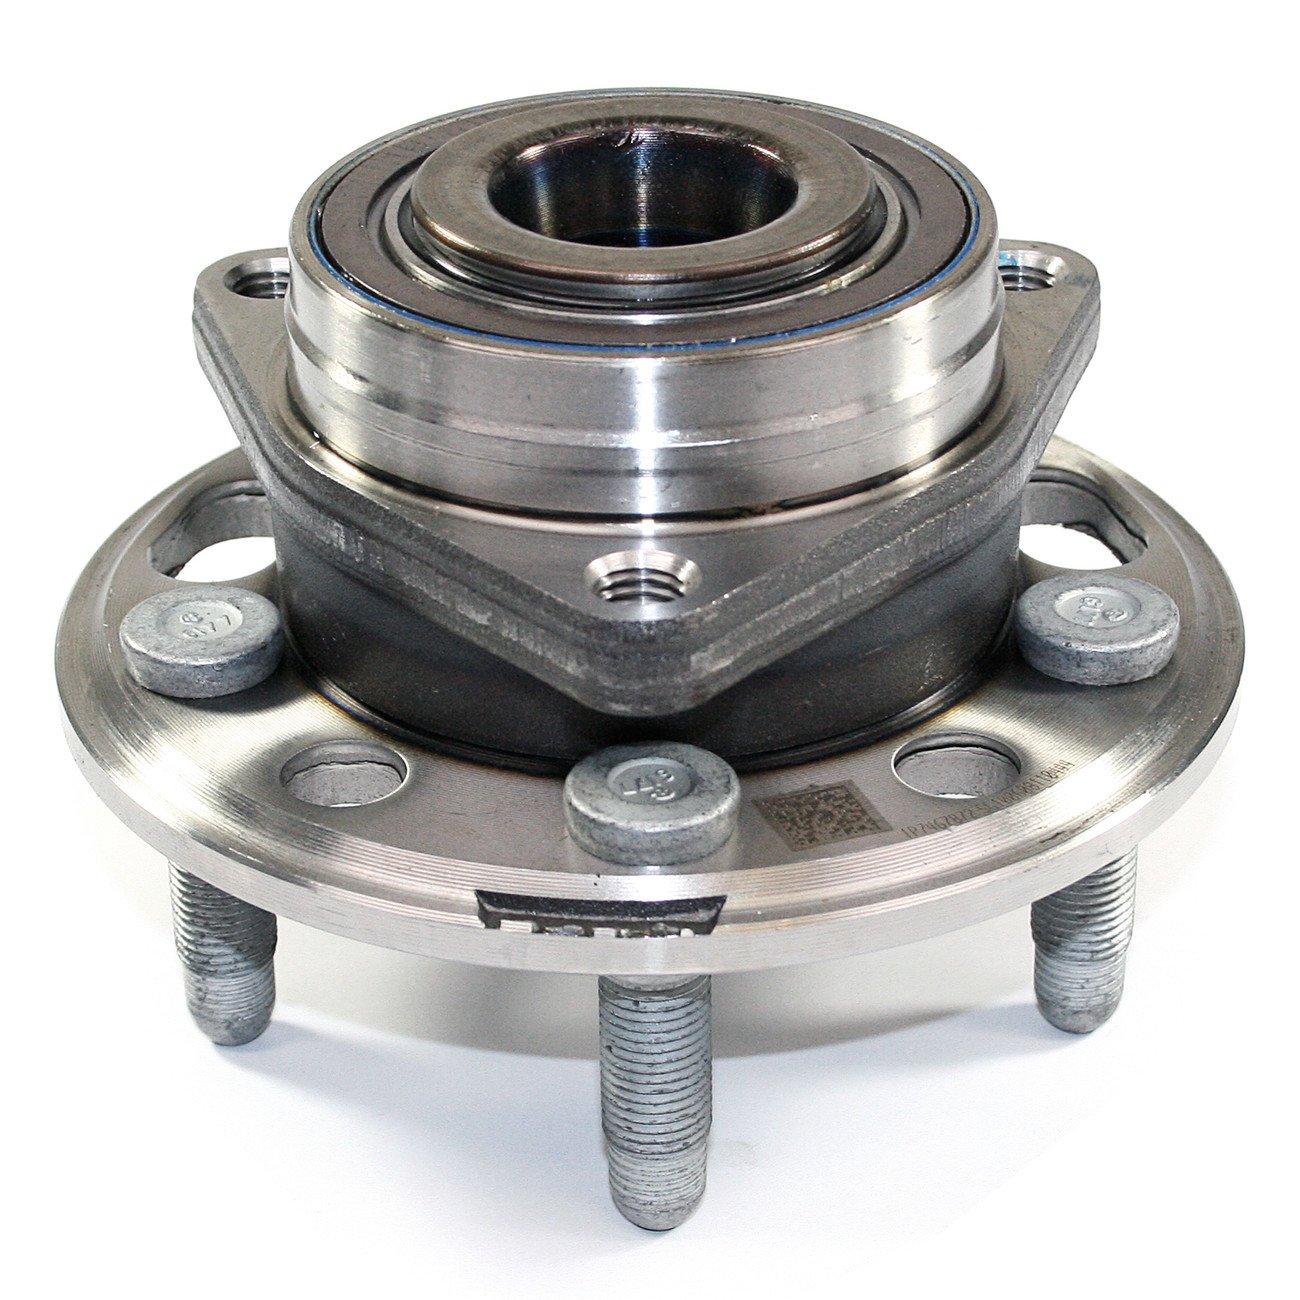 Prime Choice Auto Parts HB613290 Hub Bearing Assembly